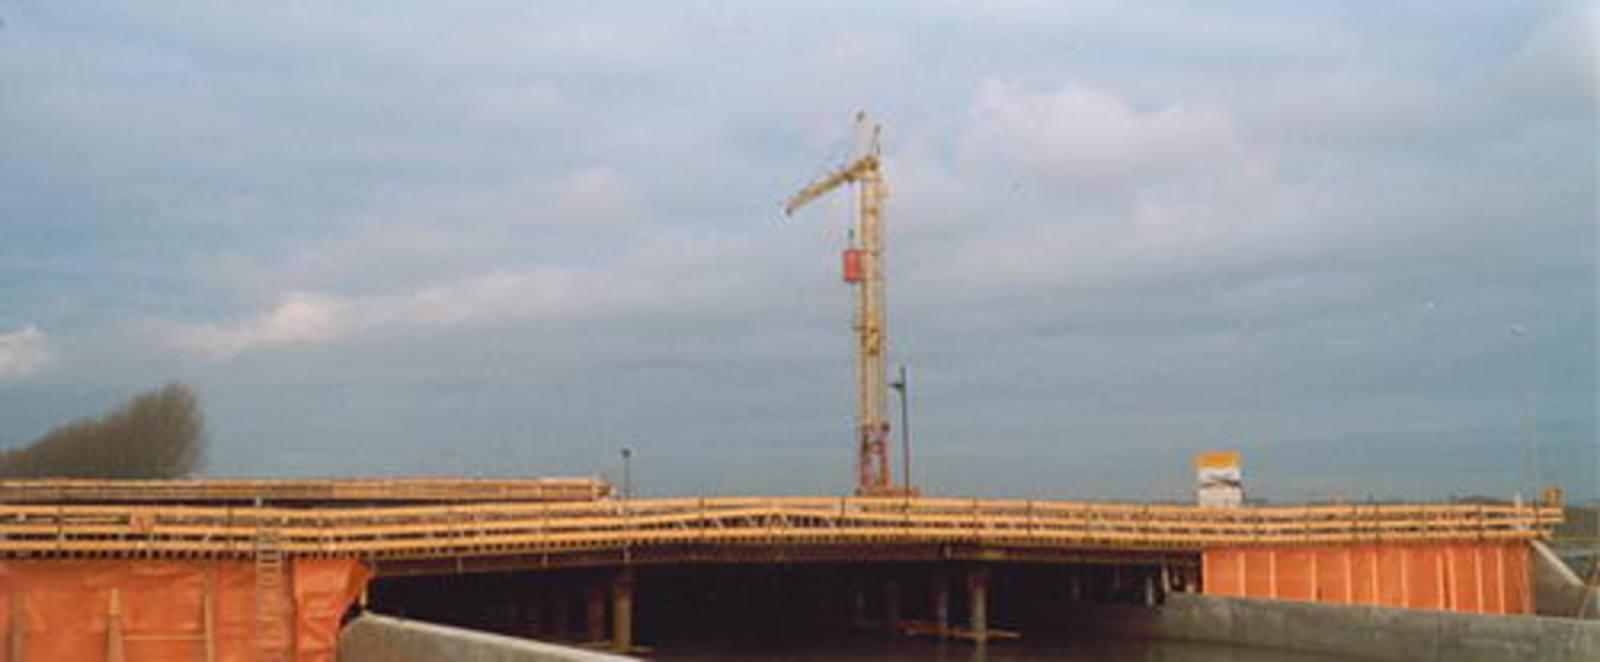 Hoofdweg W 0370± bouw Viaduct Taxibaan Schiphol 02